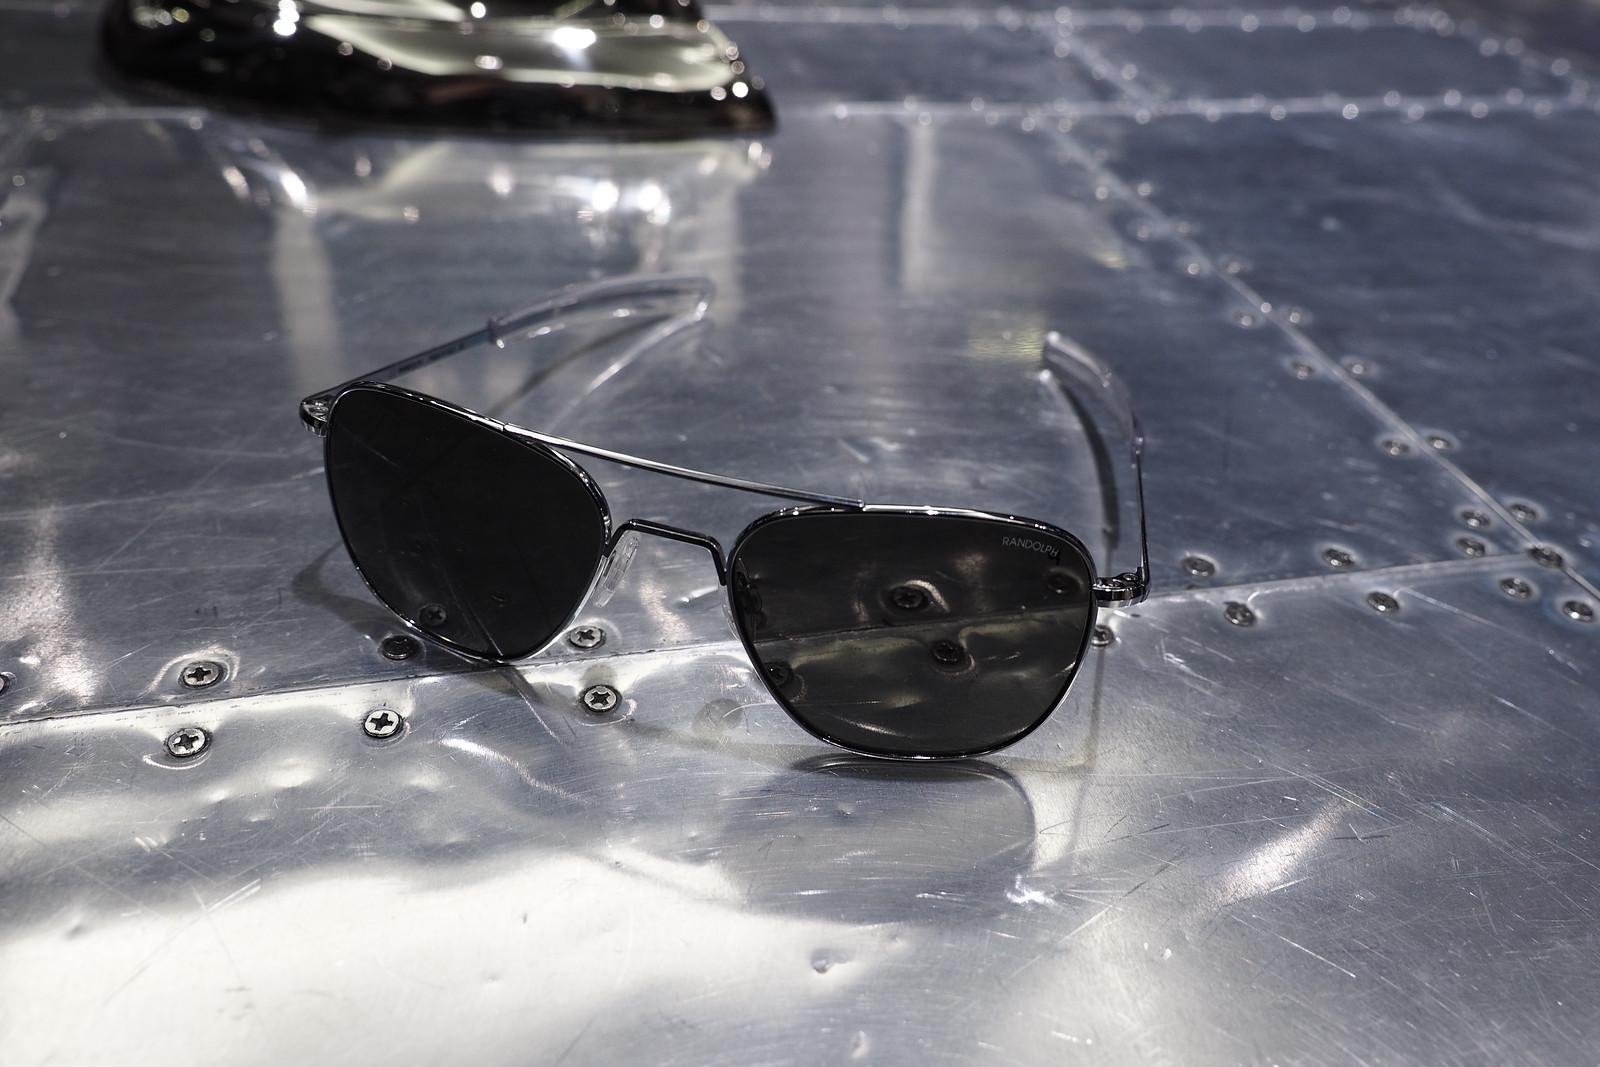 82cc90340f2 IWC Pilot s Watches + Randolph Mil-Spec Aviator Sunglasses